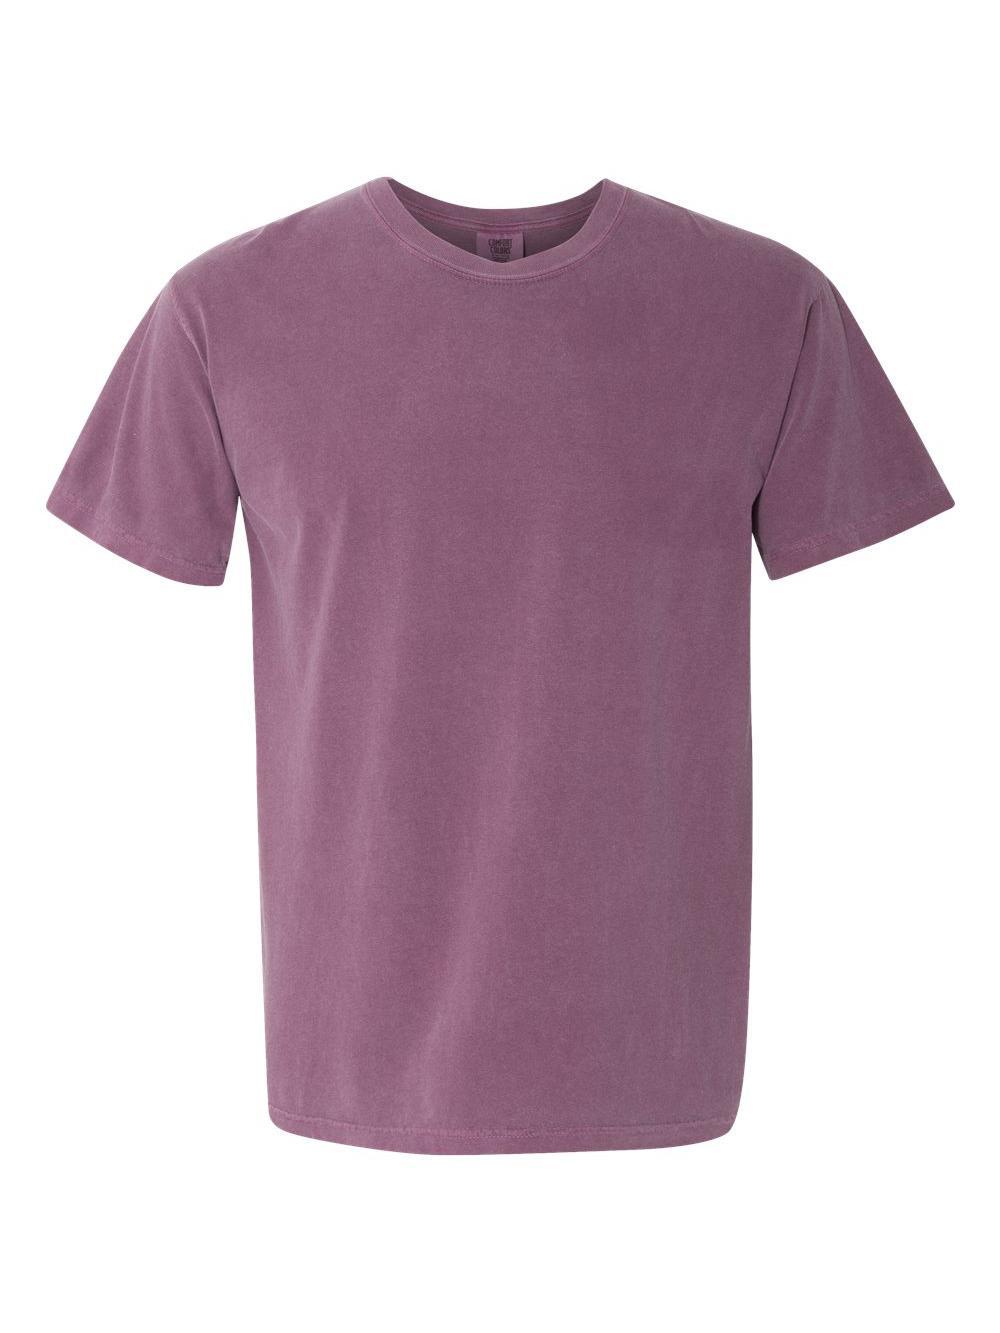 Comfort-Colors-Garment-Dyed-Heavyweight-Ringspun-Short-Sleeve-Shirt-1717 thumbnail 6